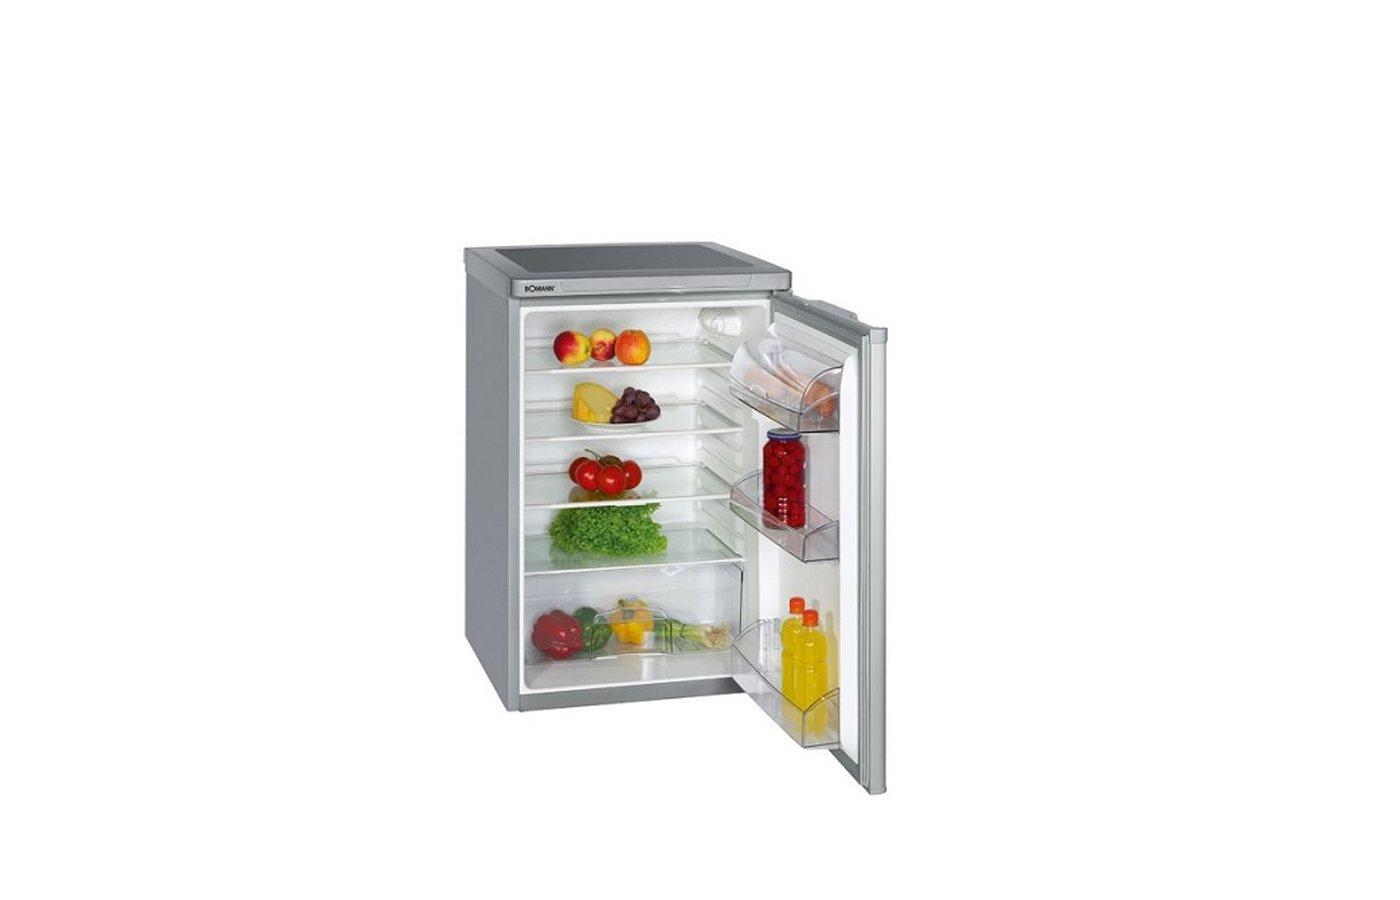 Холодильник BOMANN VS 198 silber